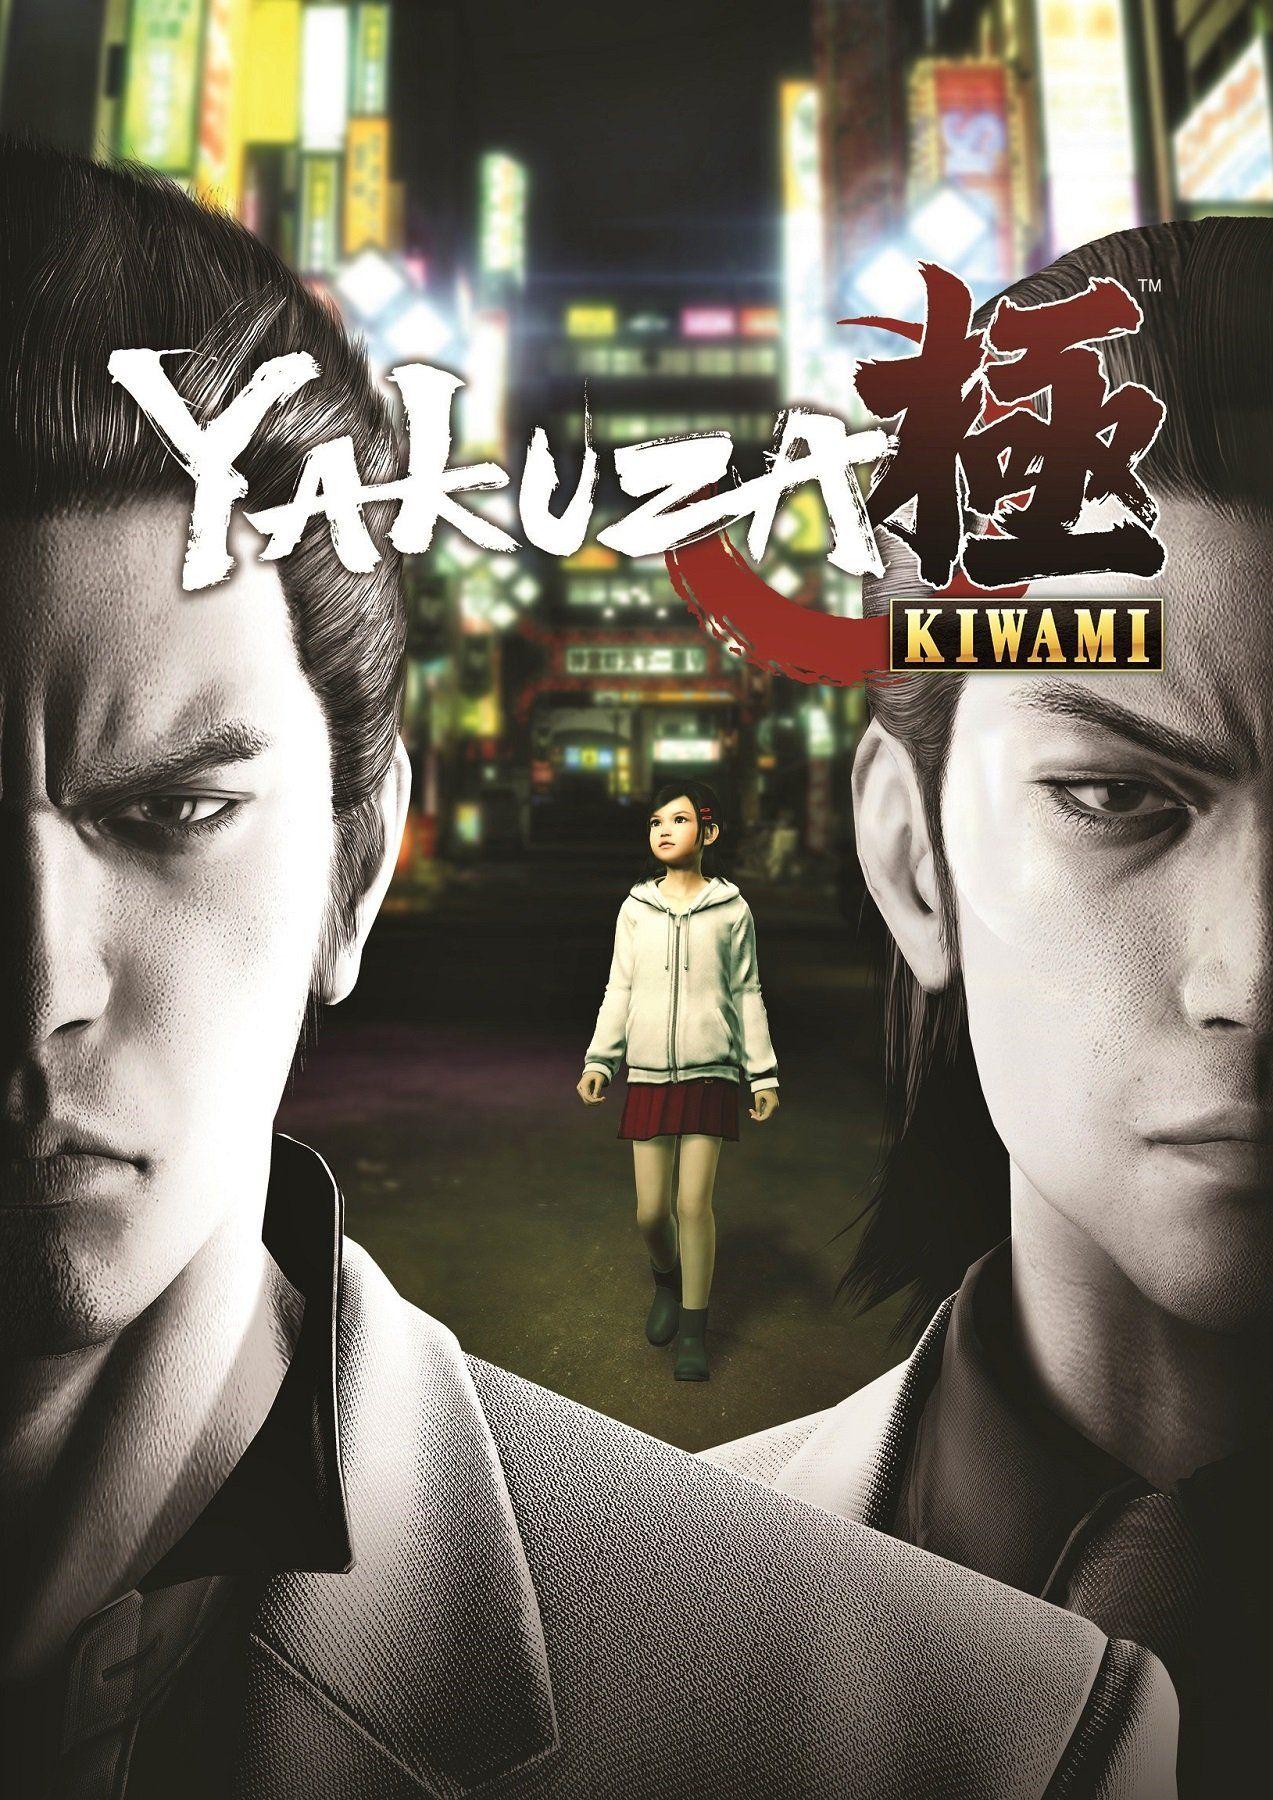 Yakuza Kiwami Poster Kiryu Video Game Posters Marvel Entertainment